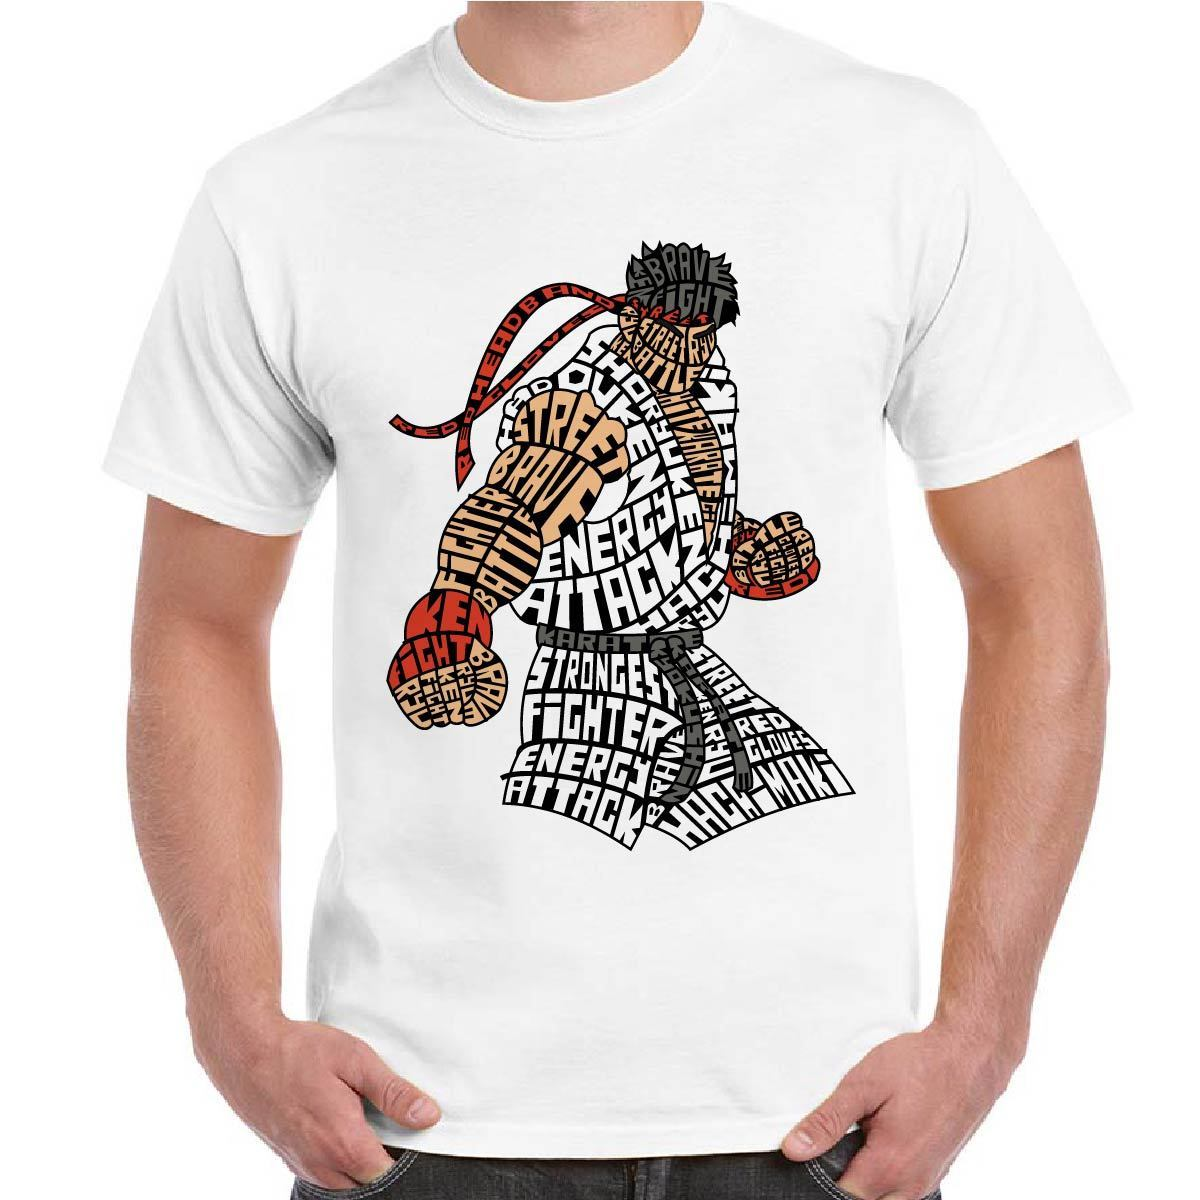 2017-fashion-print-t-shirt-uomo-maglietta-maniche-corte-fontbvideogames-b-font-street-fighters-stamp